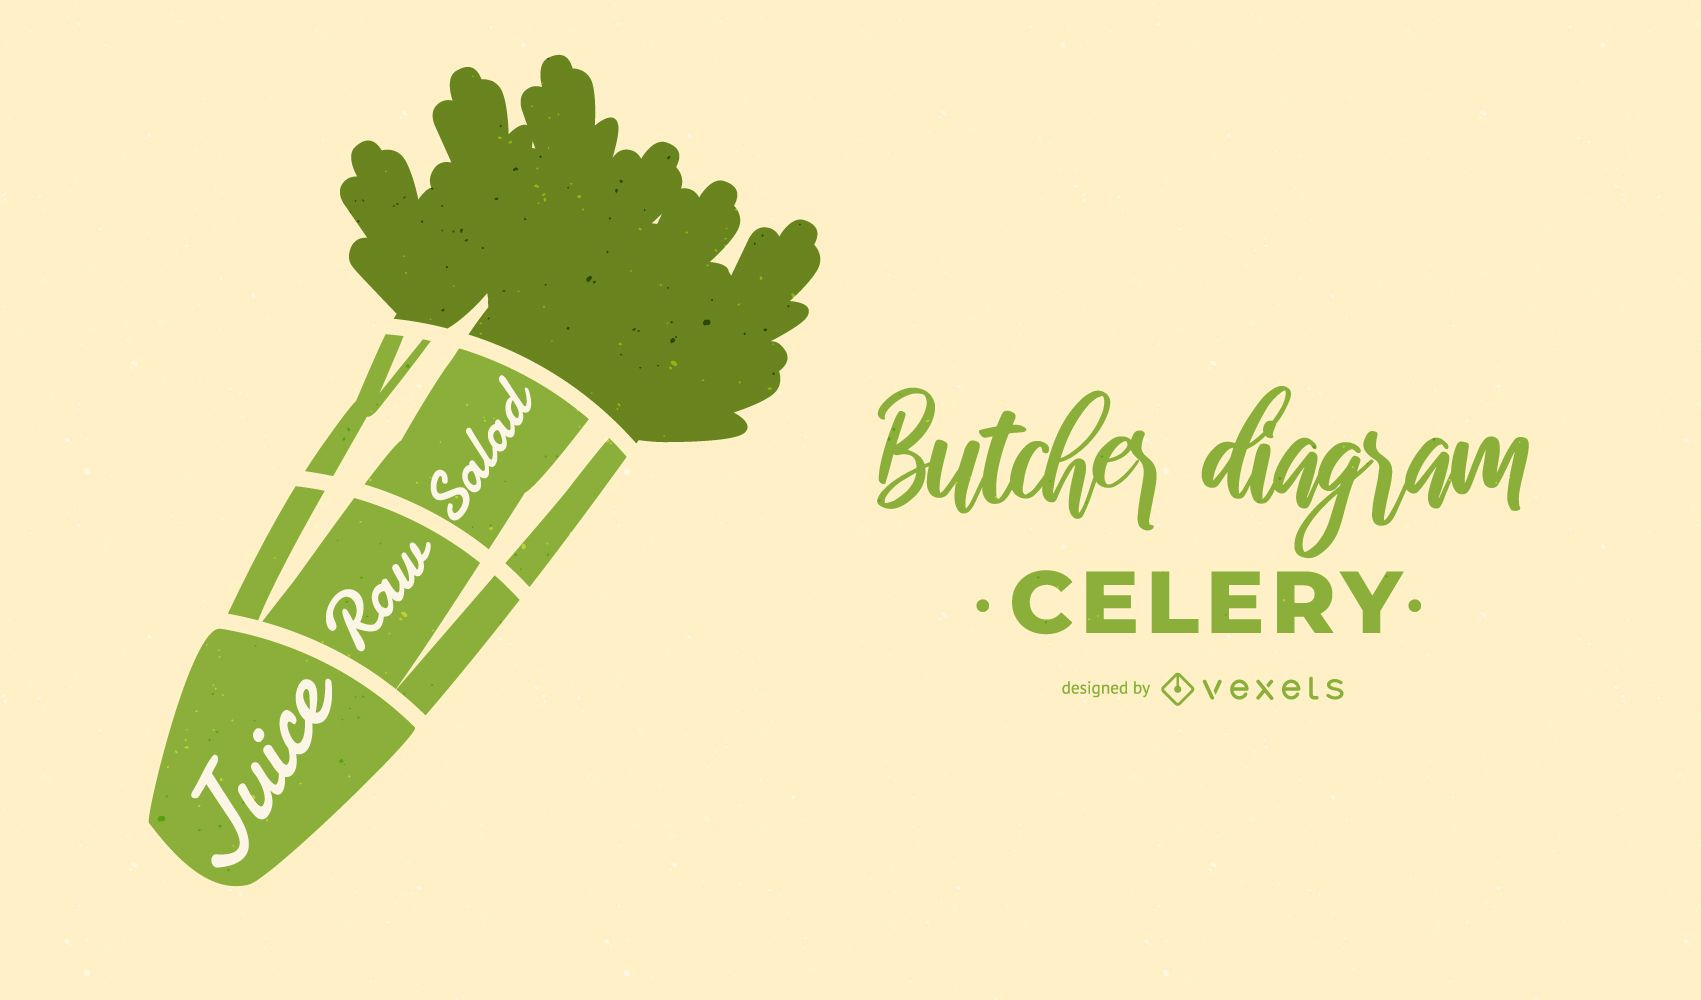 Celery Butcher Diagram Design